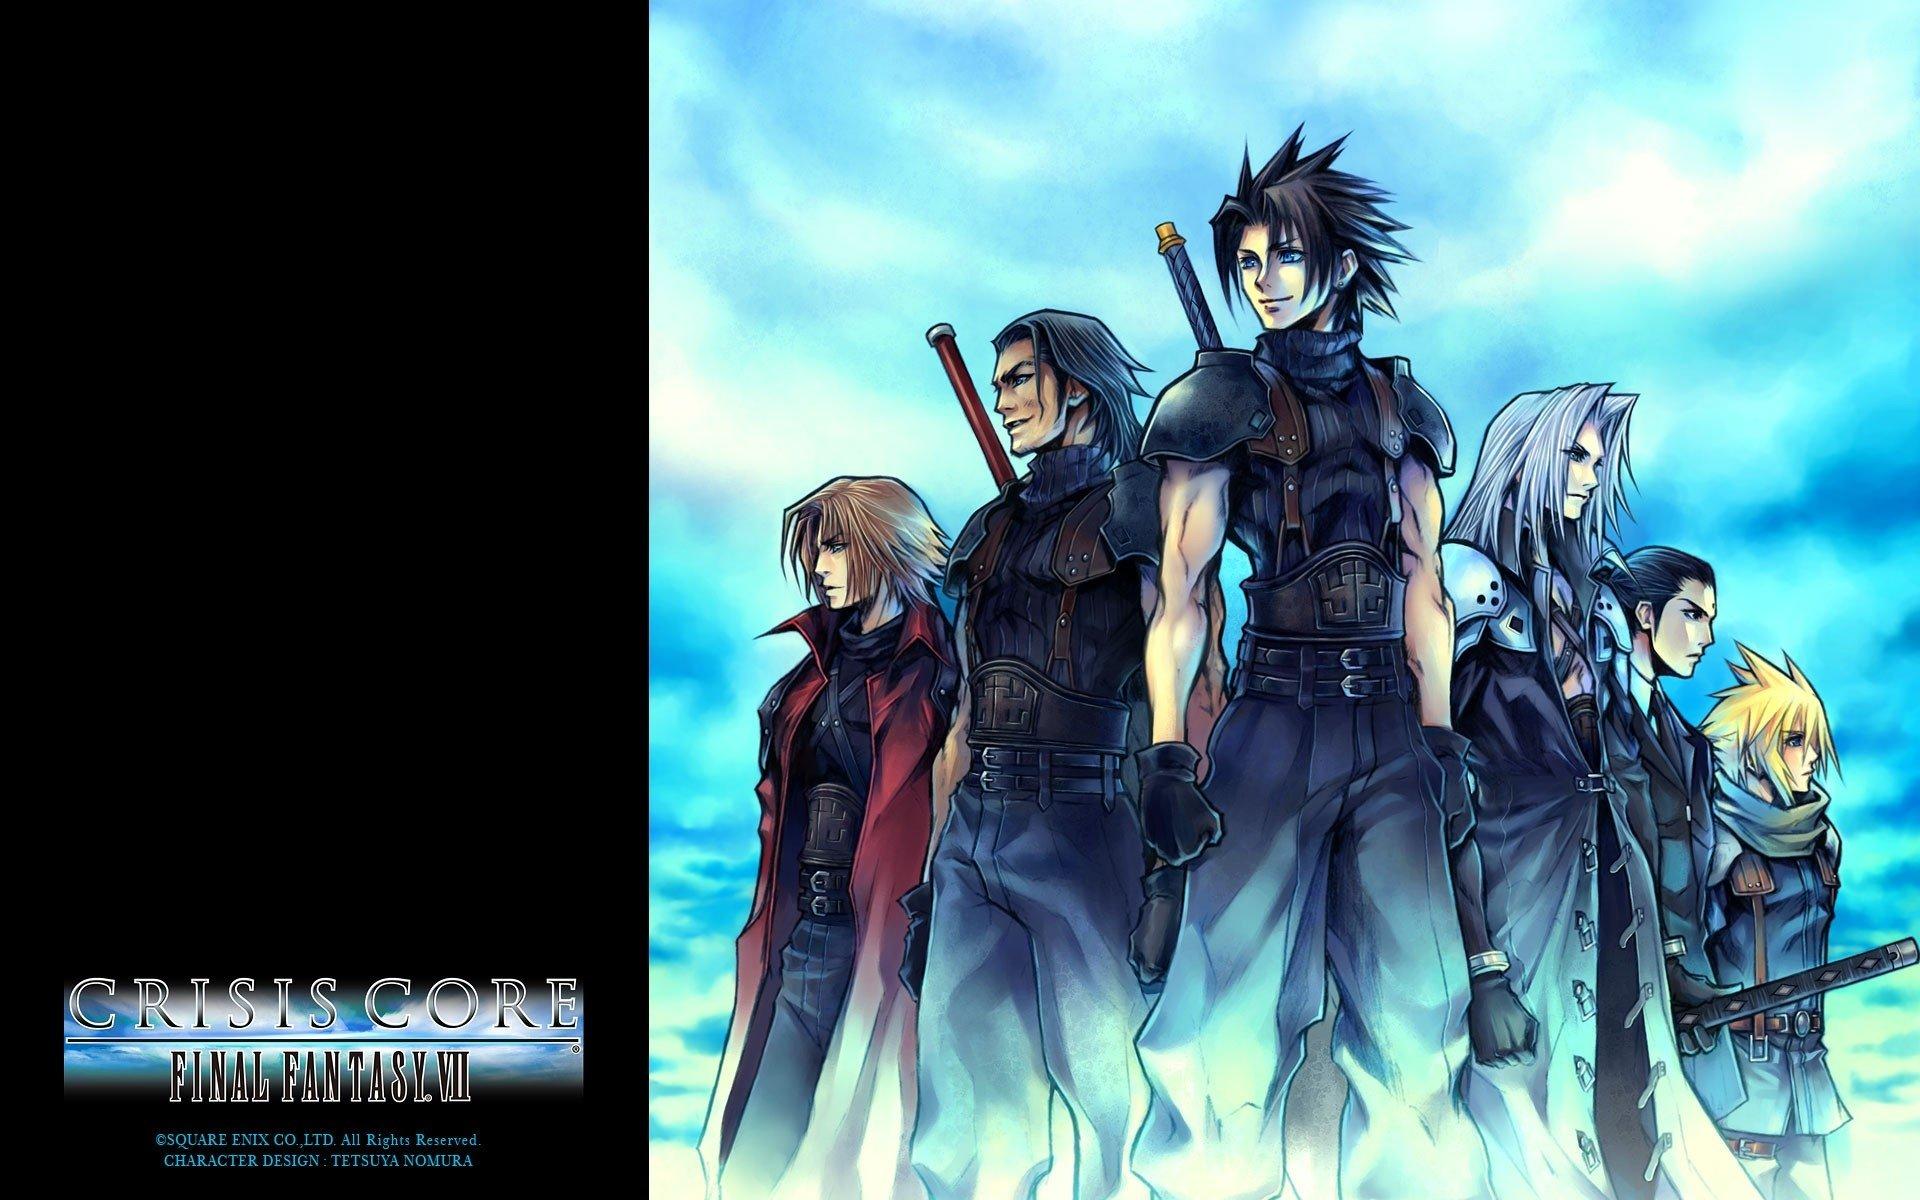 Crisis Core Final Fantasy Vii Hd Wallpaper Background Image